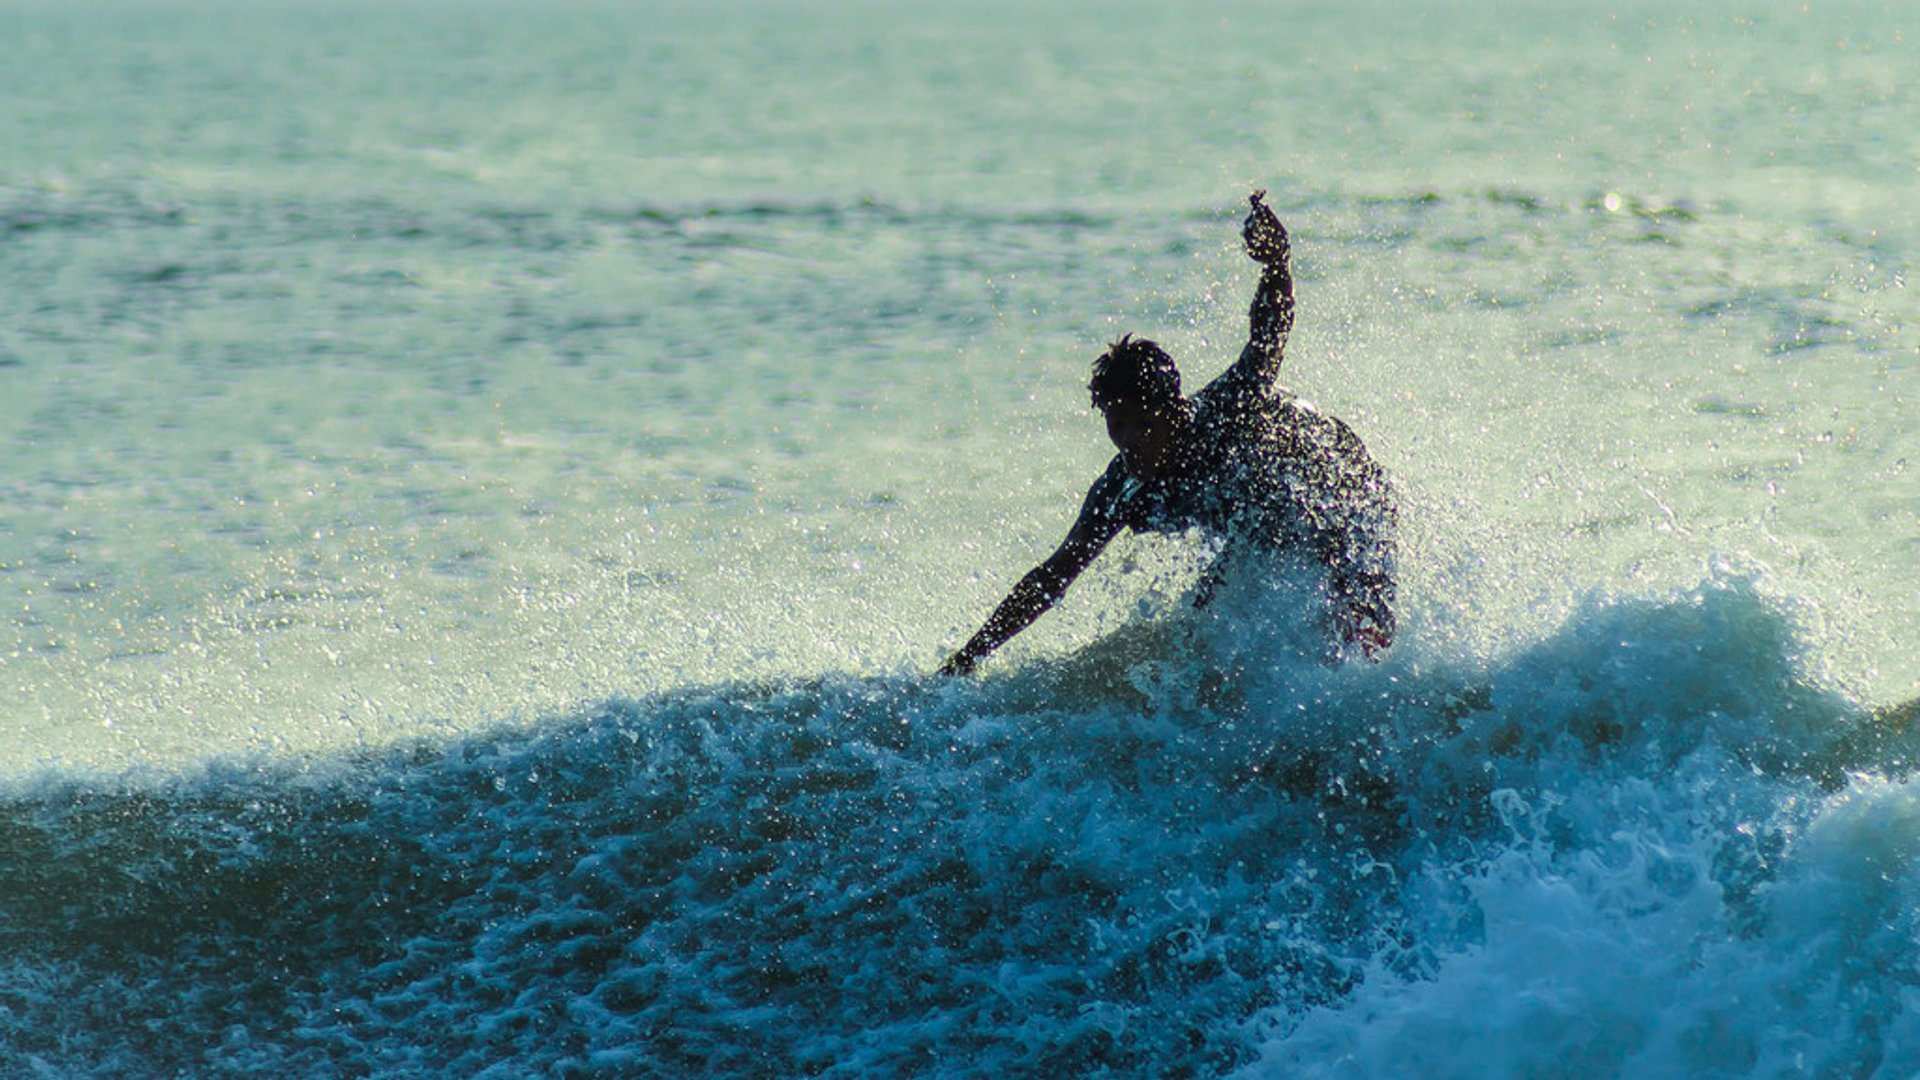 Surfing in India - Best Season